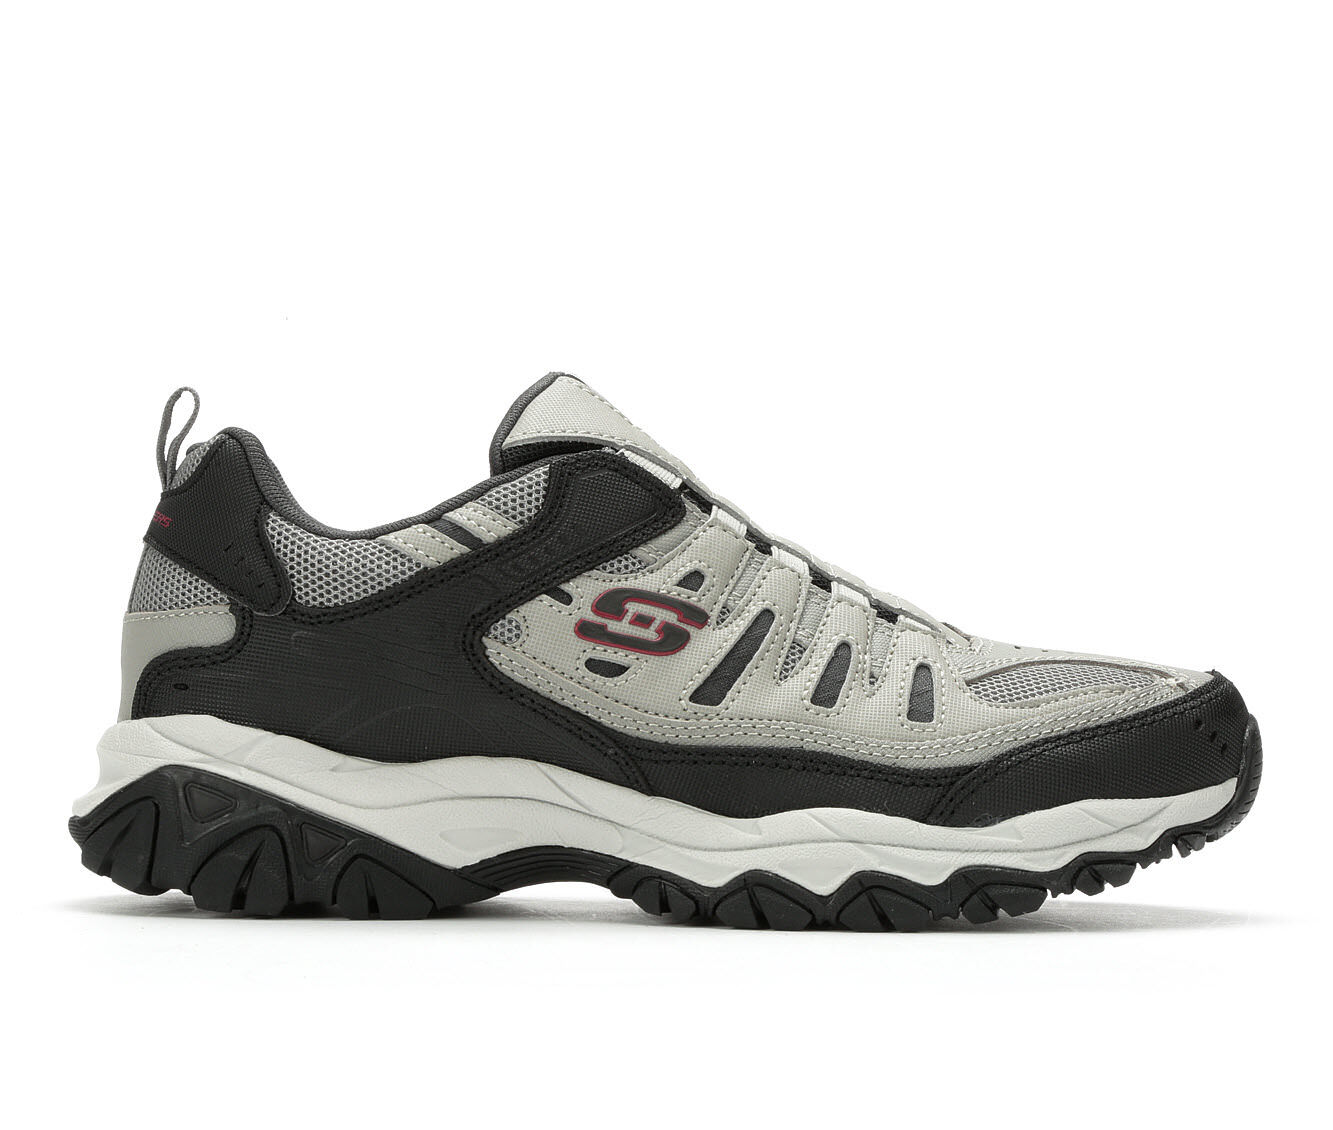 Men's Skechers Wonted 51866 Training Shoes Grey/Black